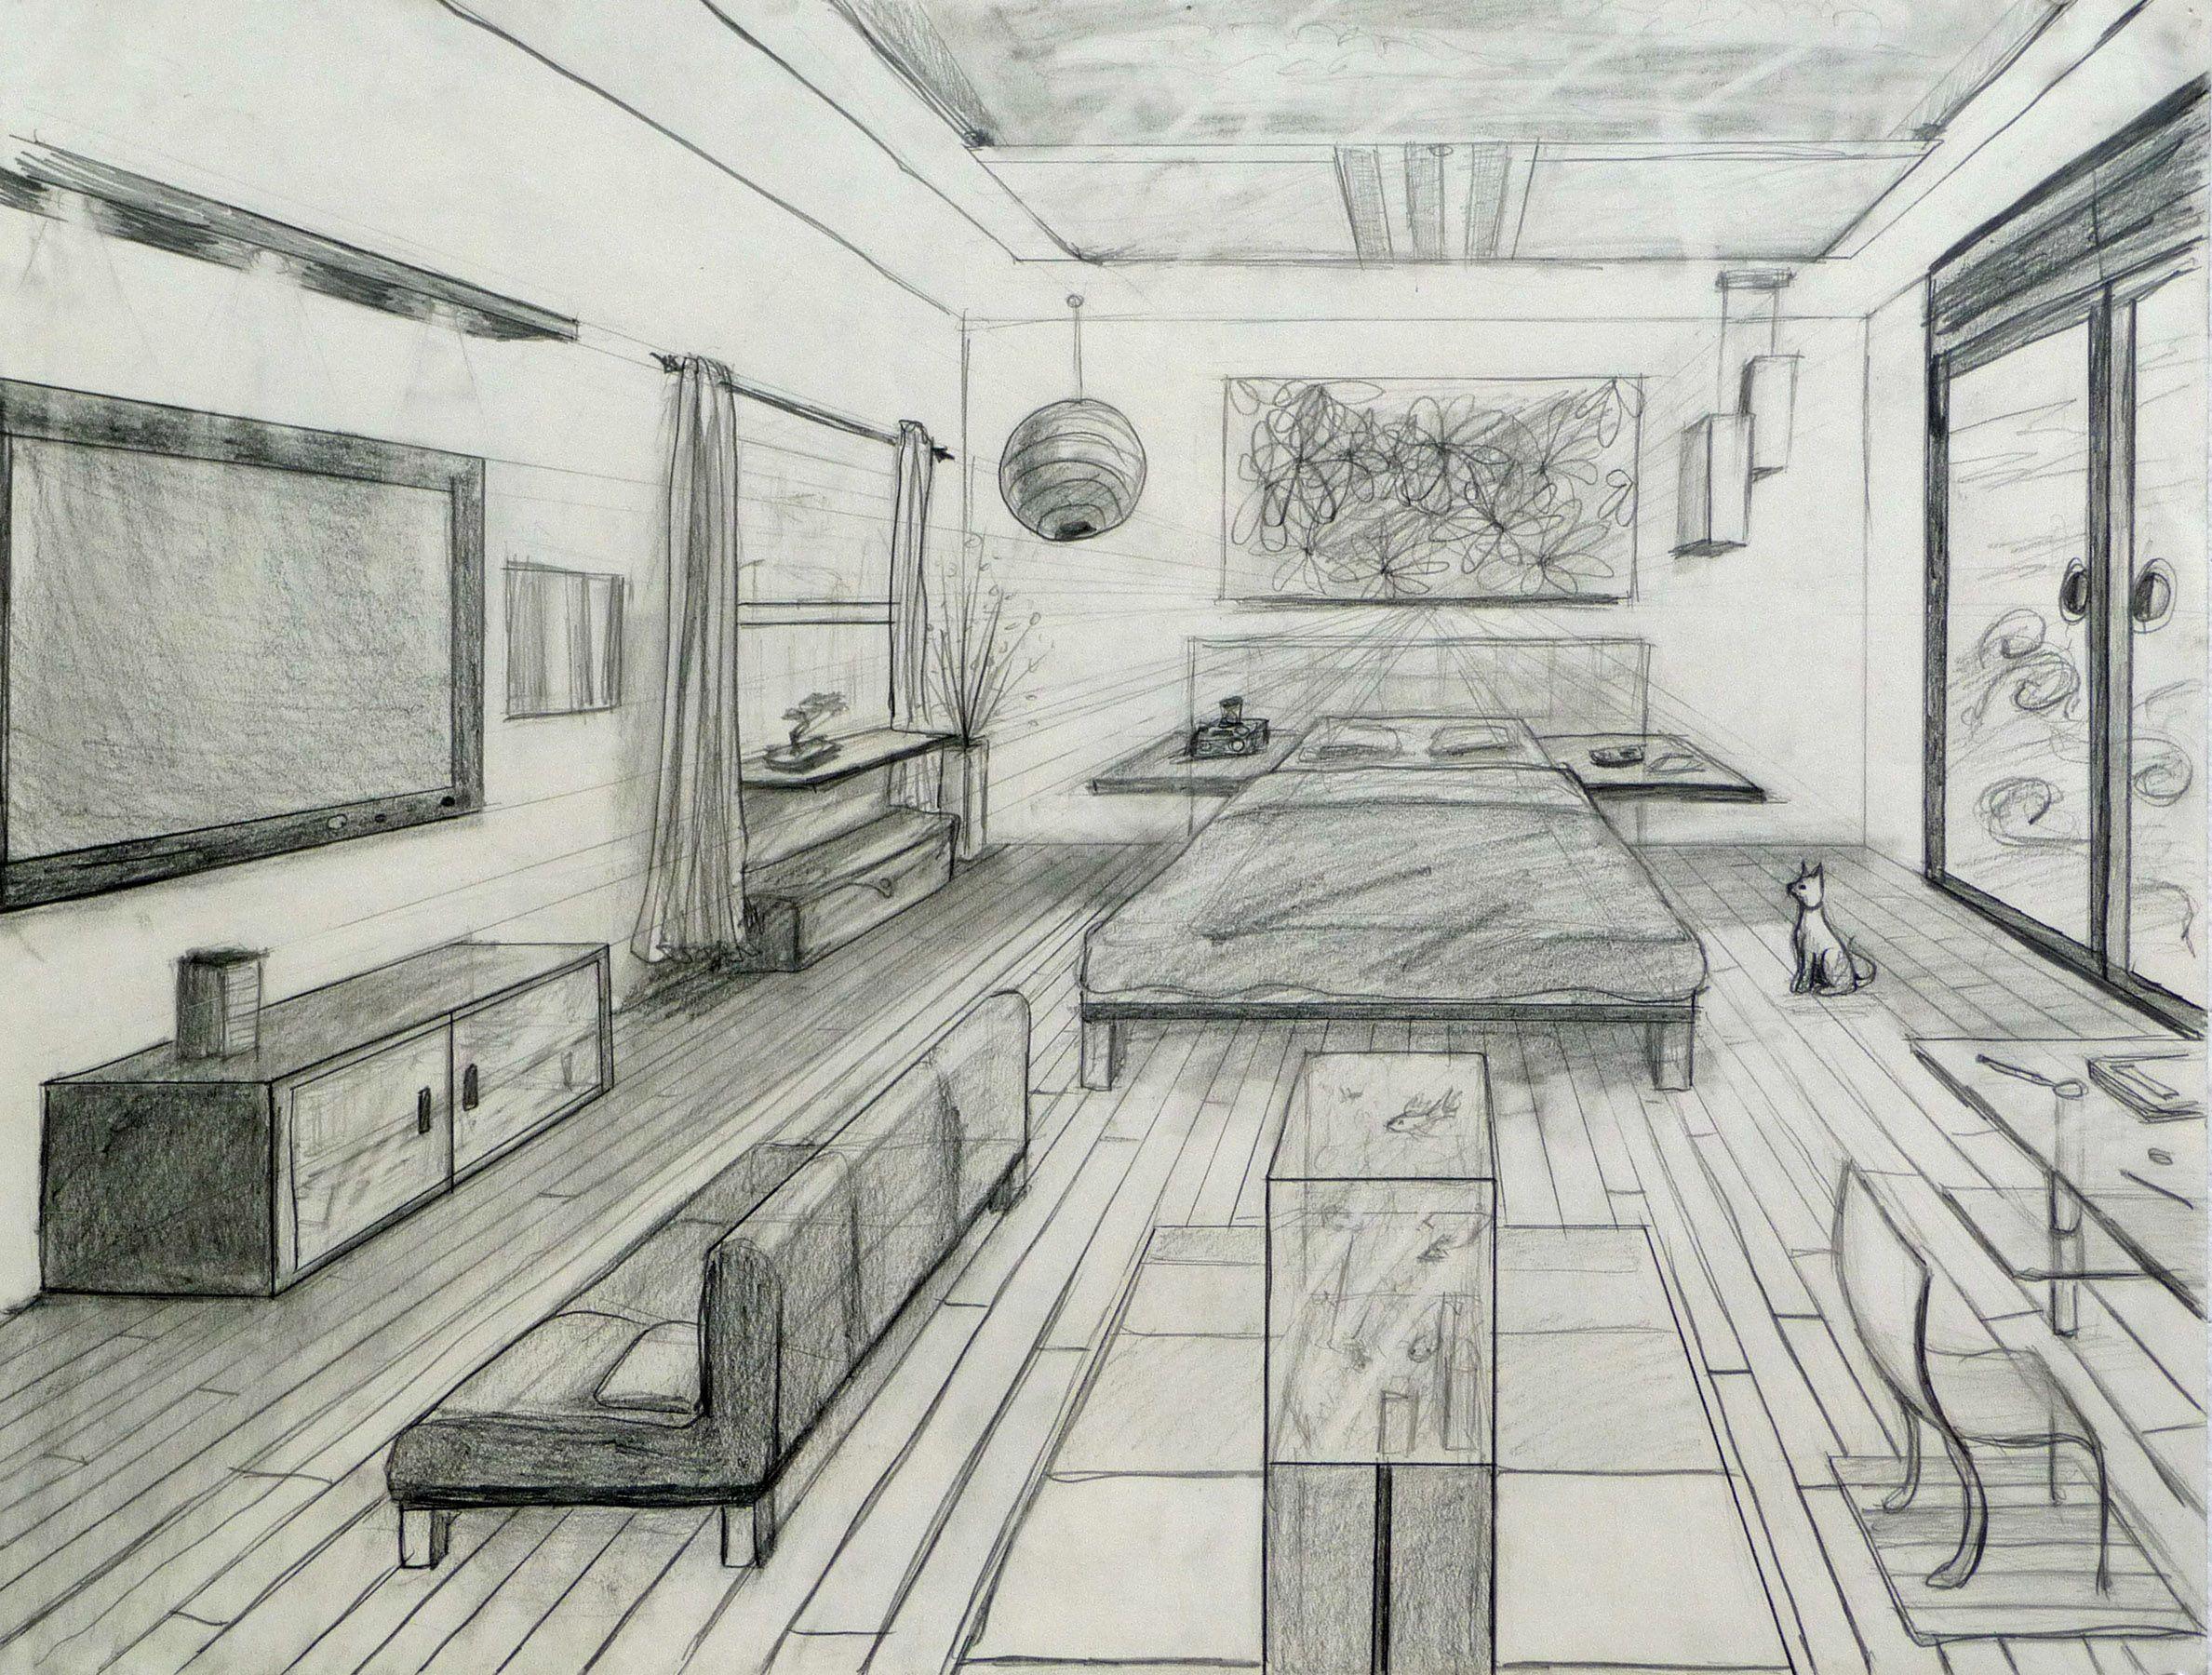 1 Pt Perspective Room